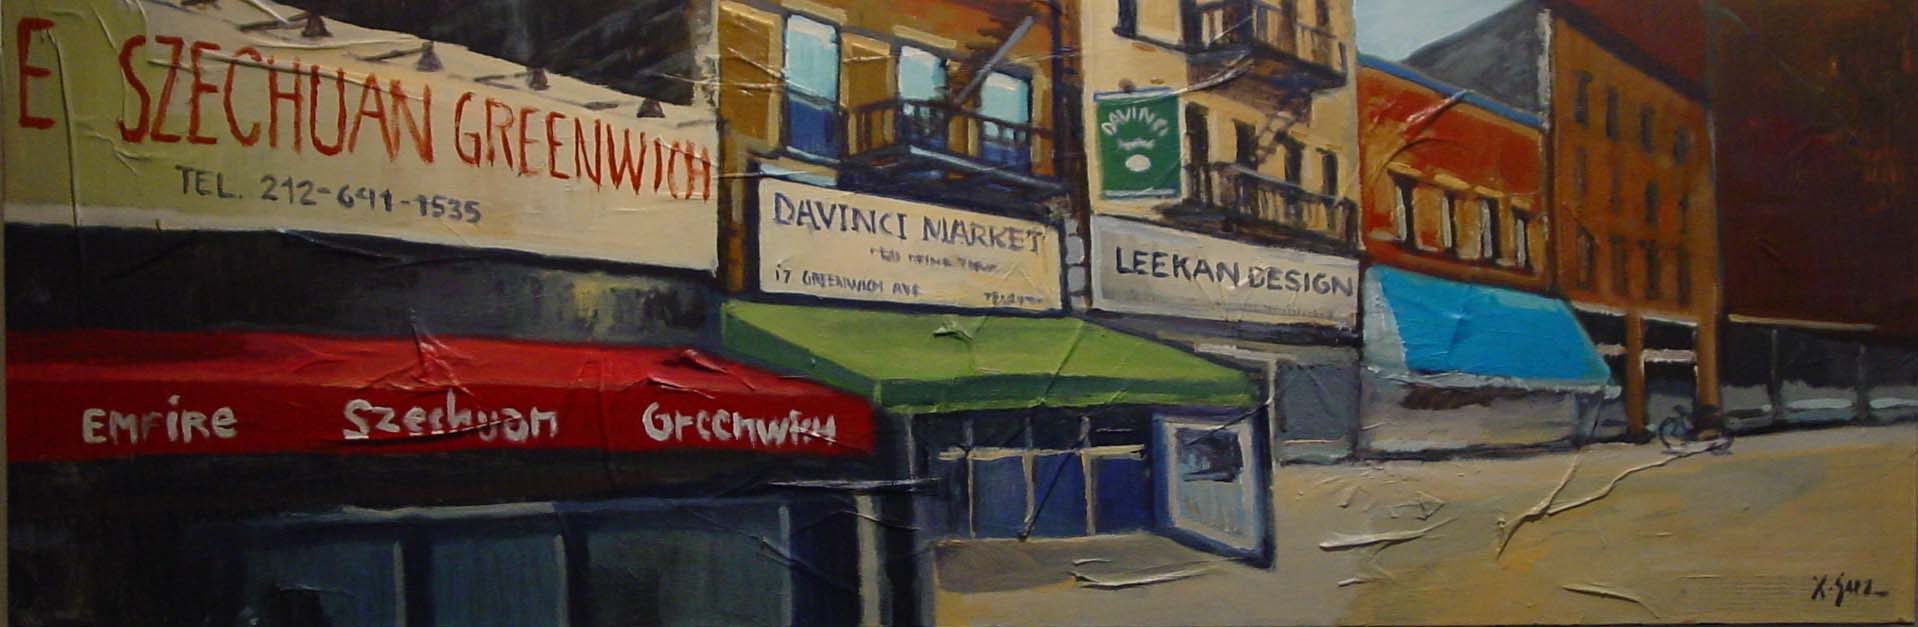 saez_xavi_davinci_market